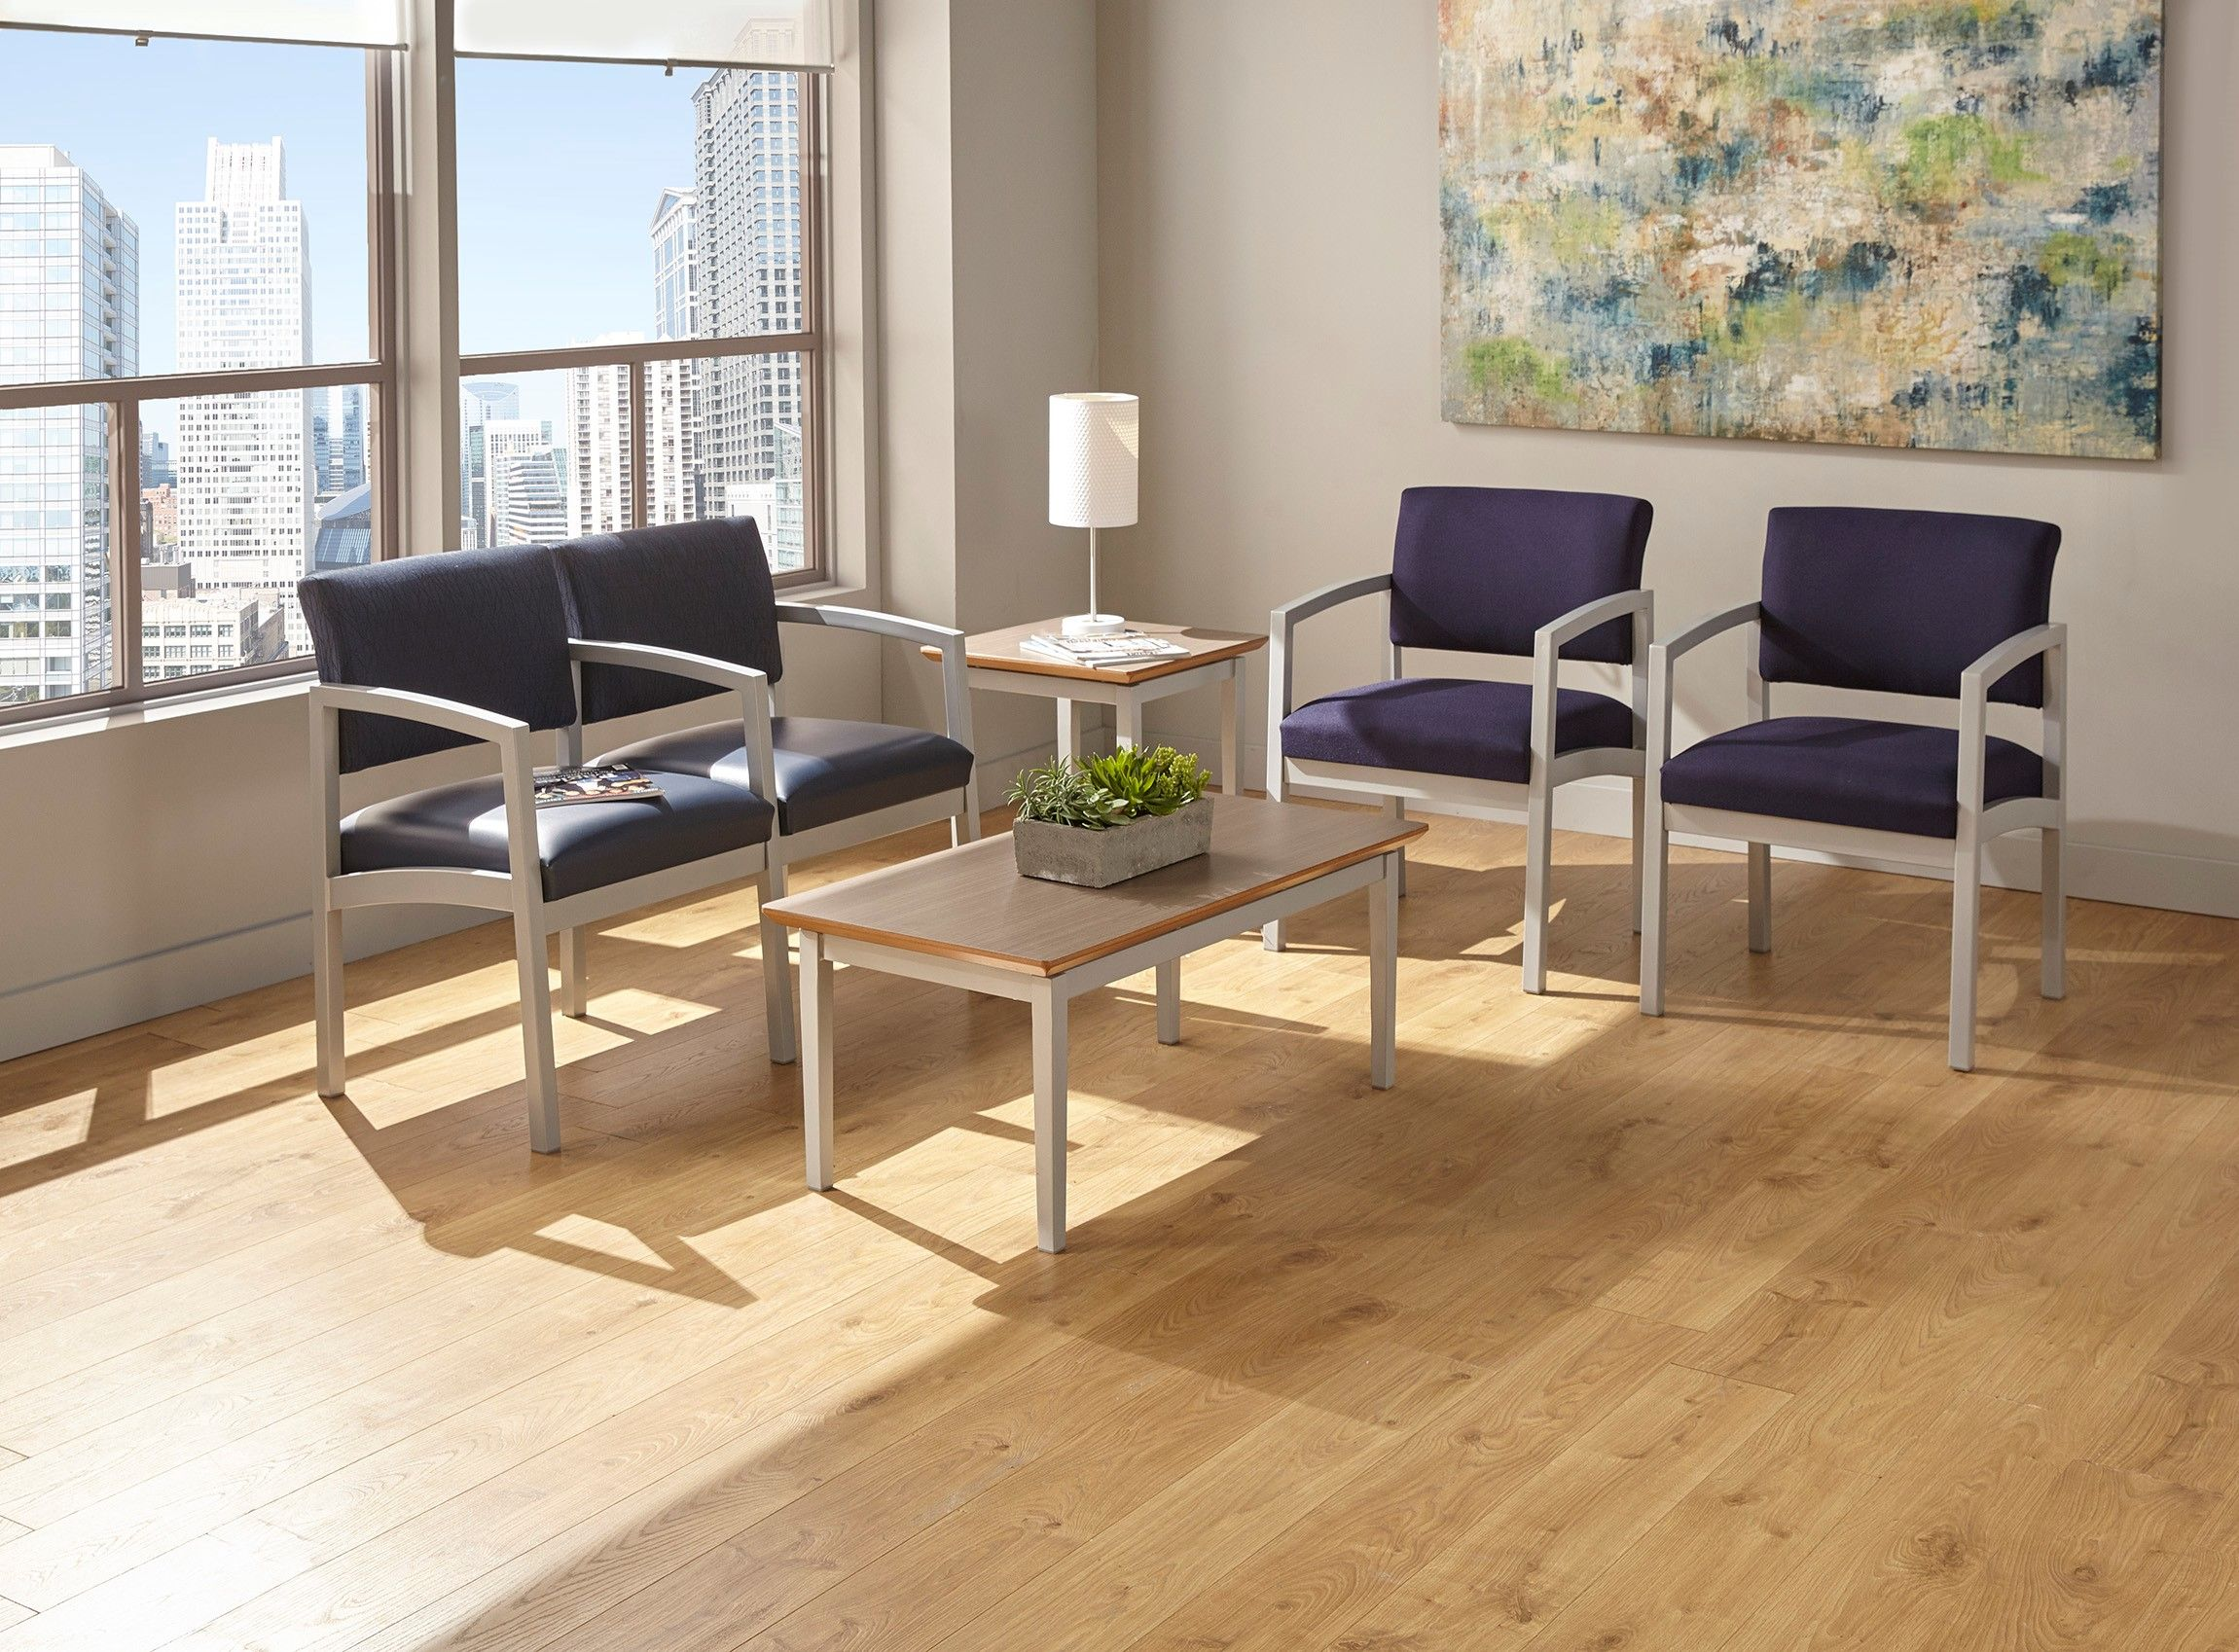 Office Waiting Room Furniture waitingroom officedesign  ...